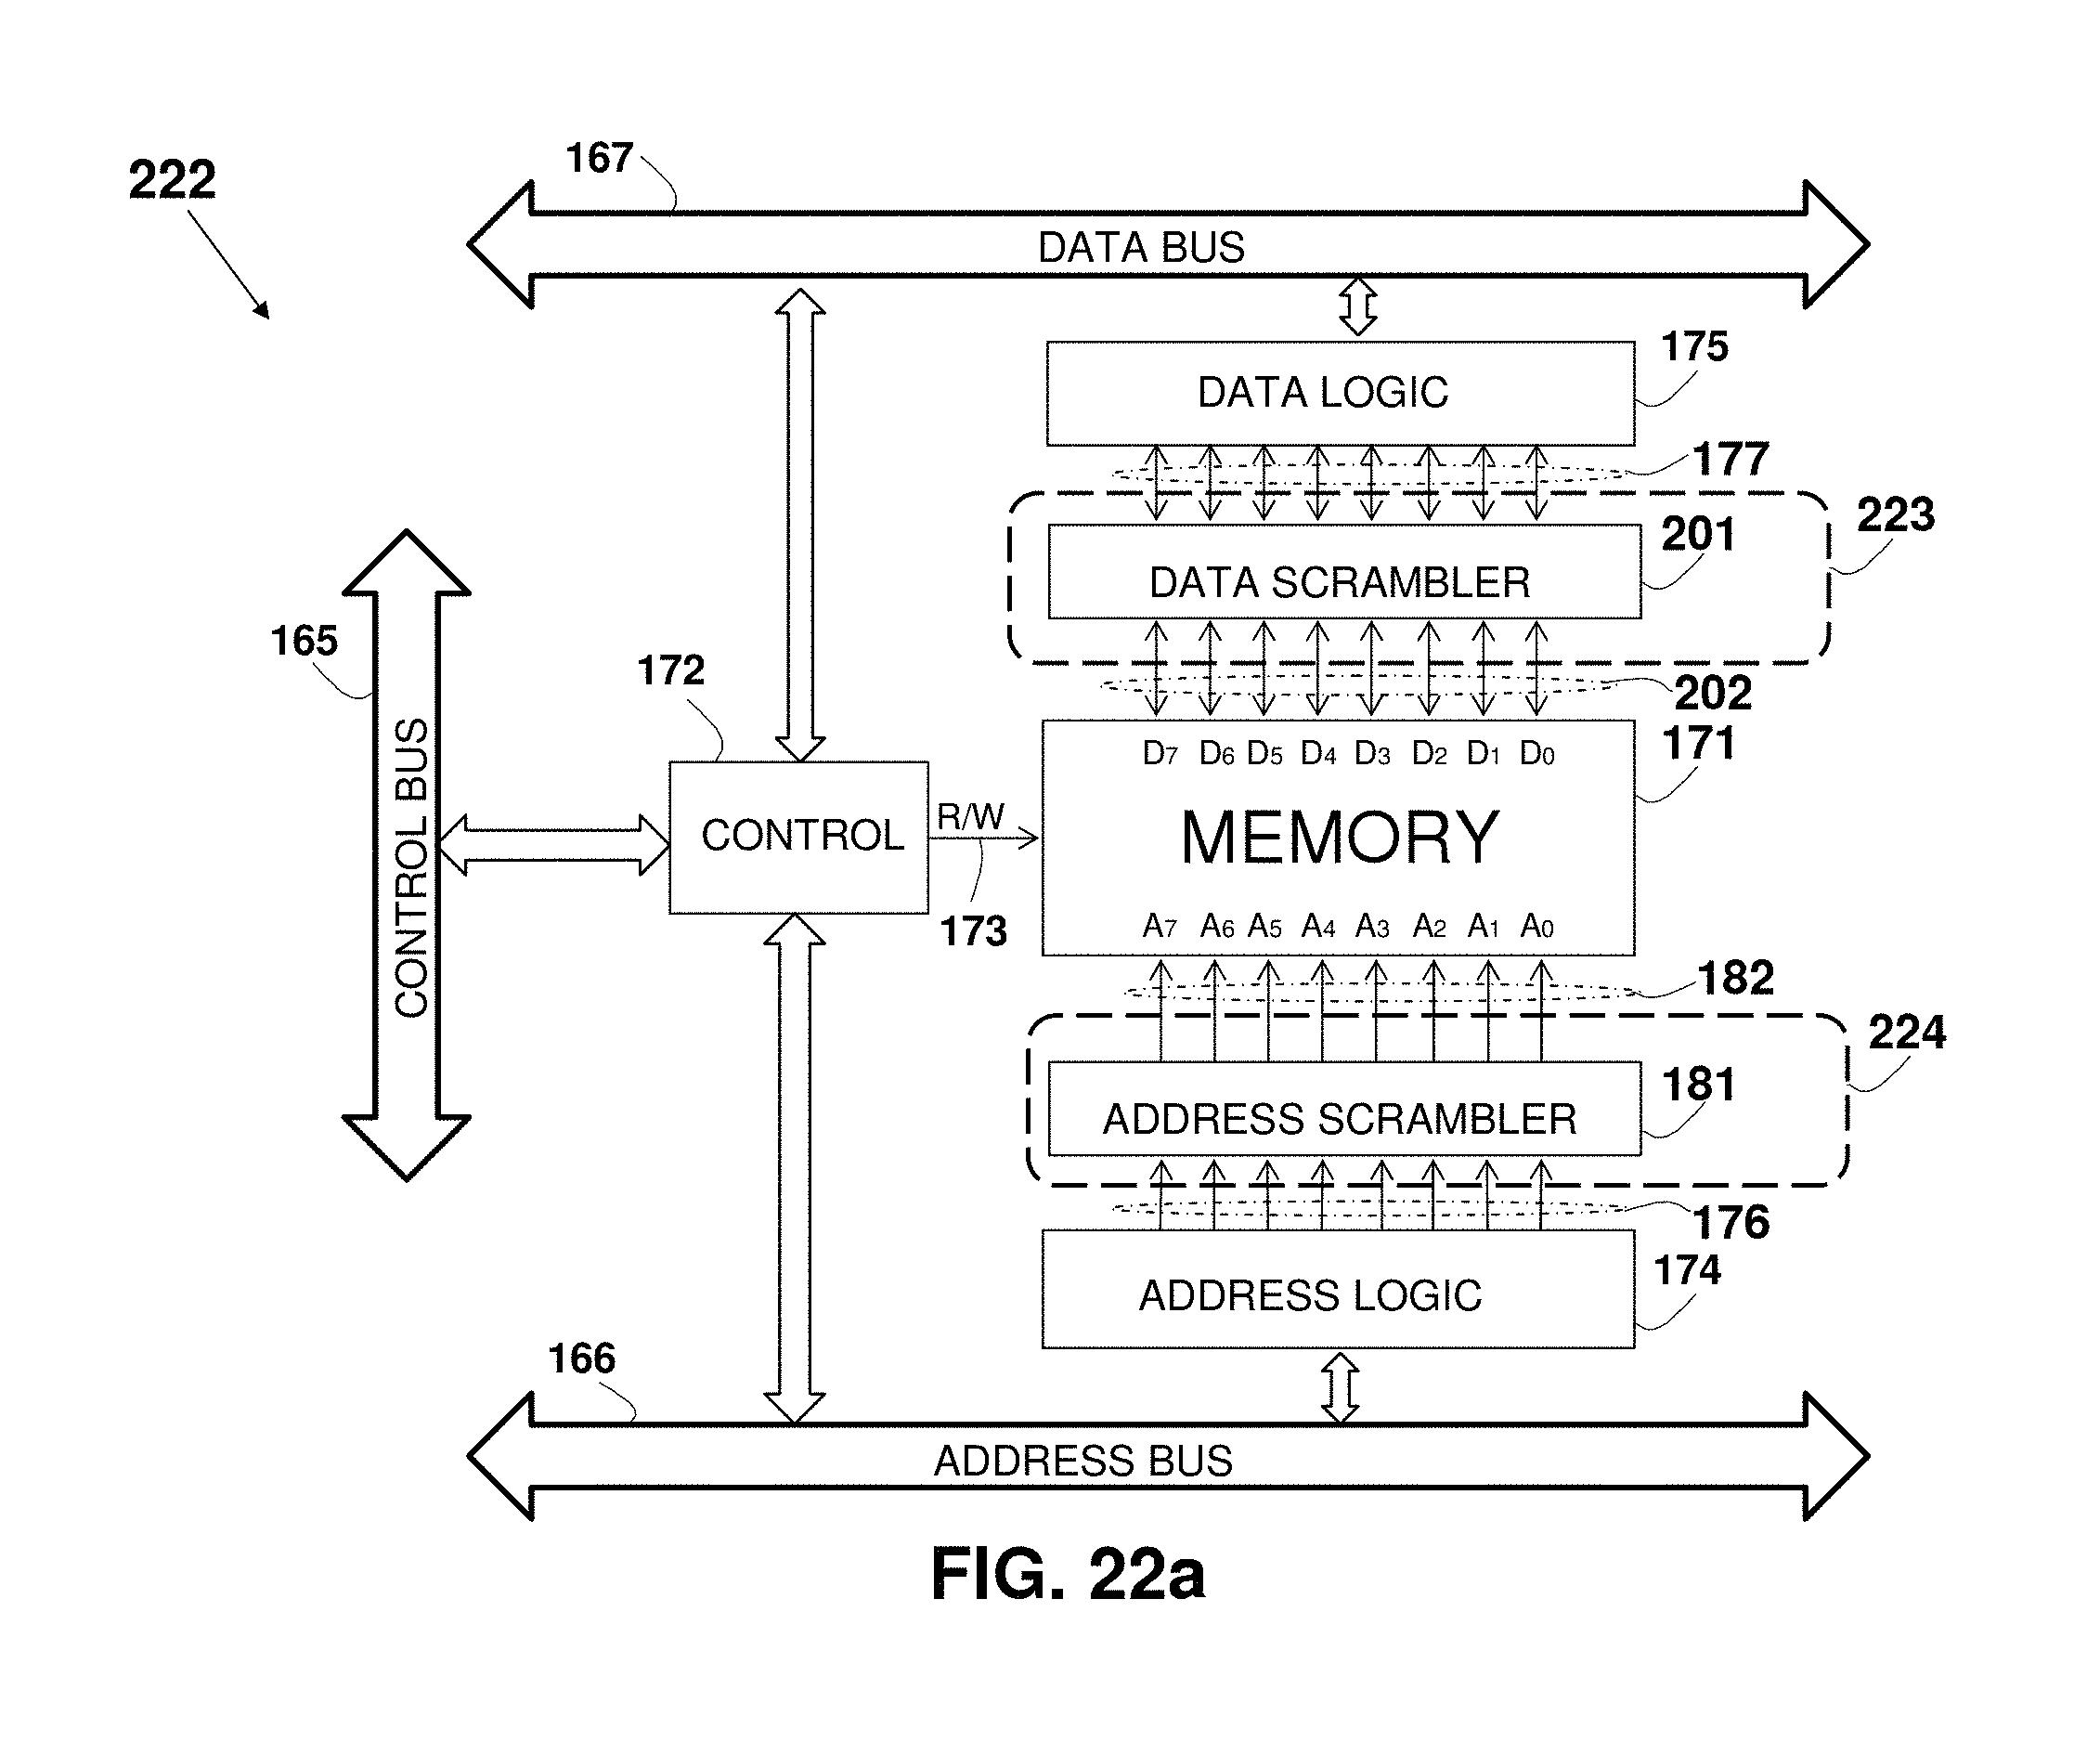 Patent US 9,762,547 B2